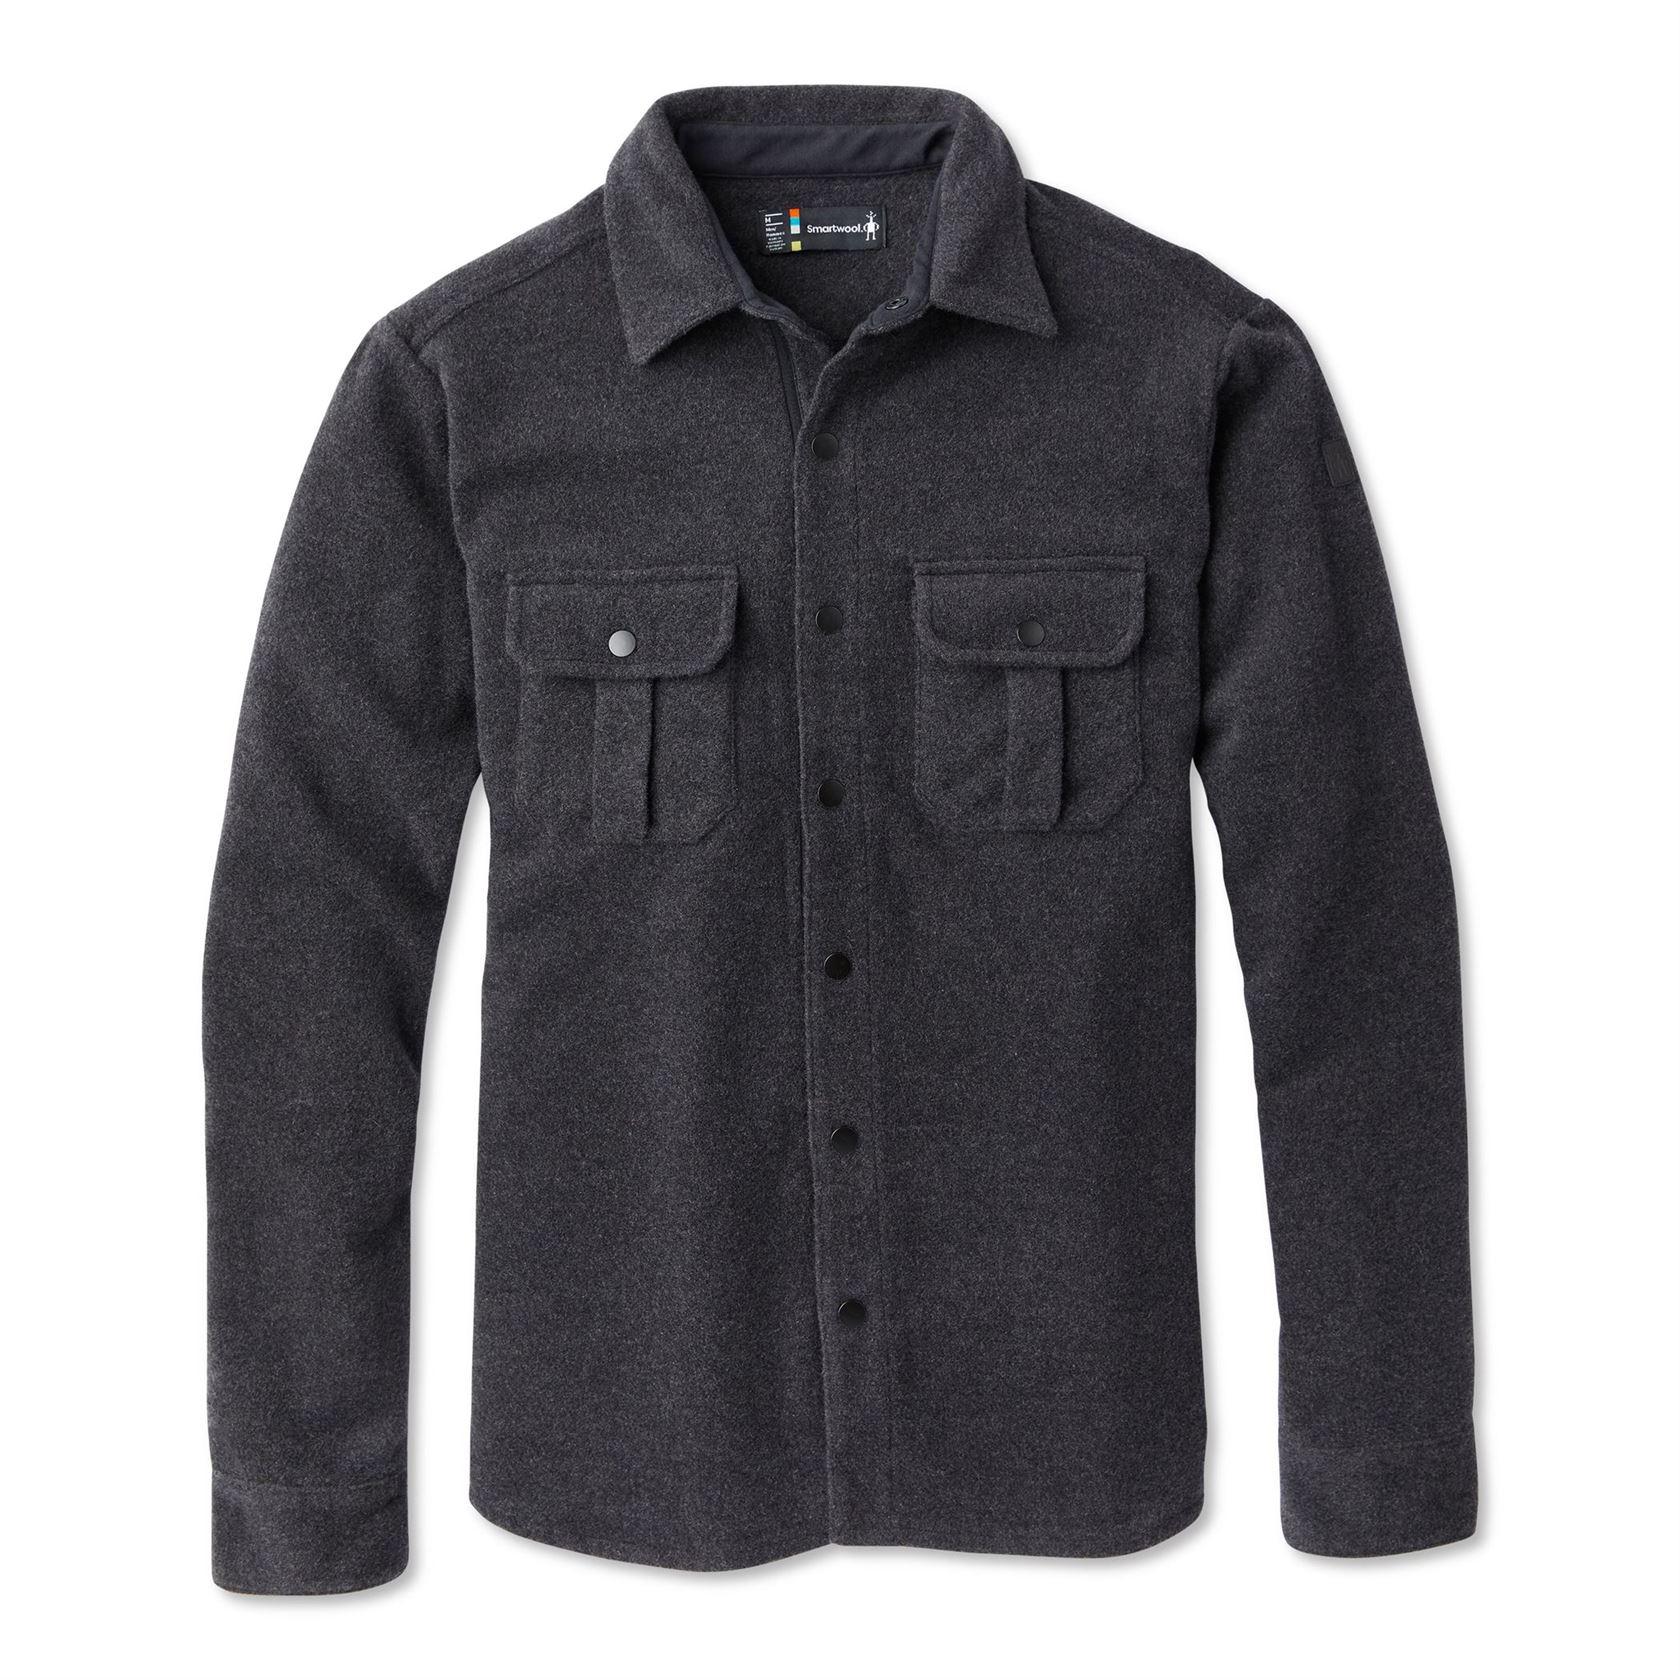 Anchor Line Shirt Jacket - Men's